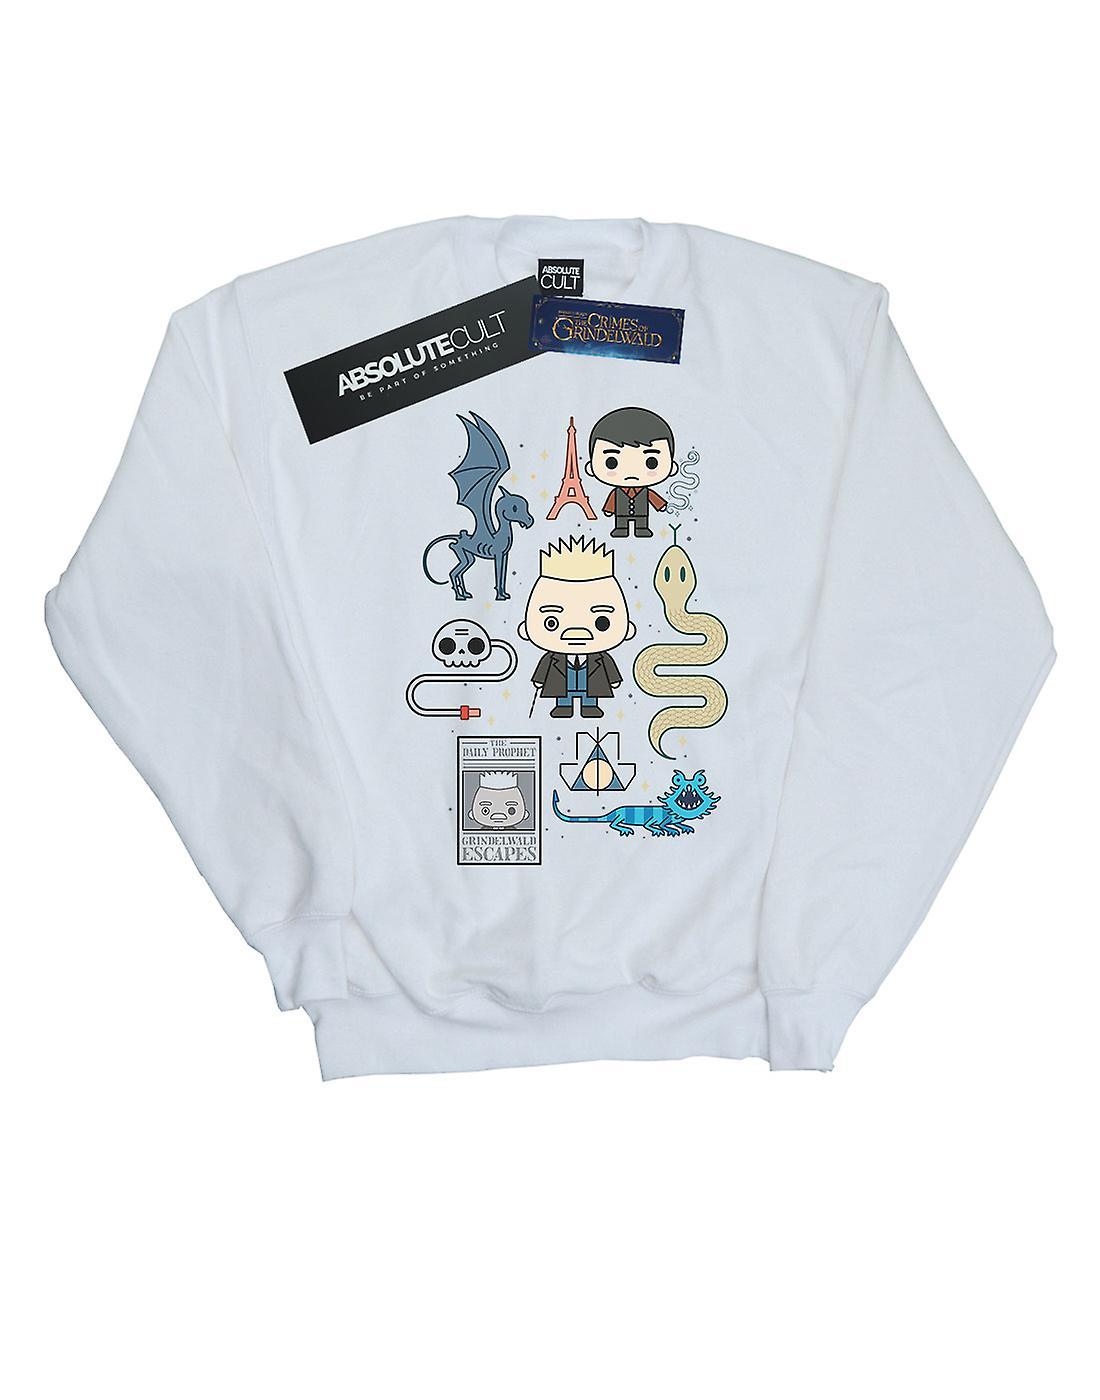 Fantastic Beasts Girls Chibi Grindelwald Sweatshirt